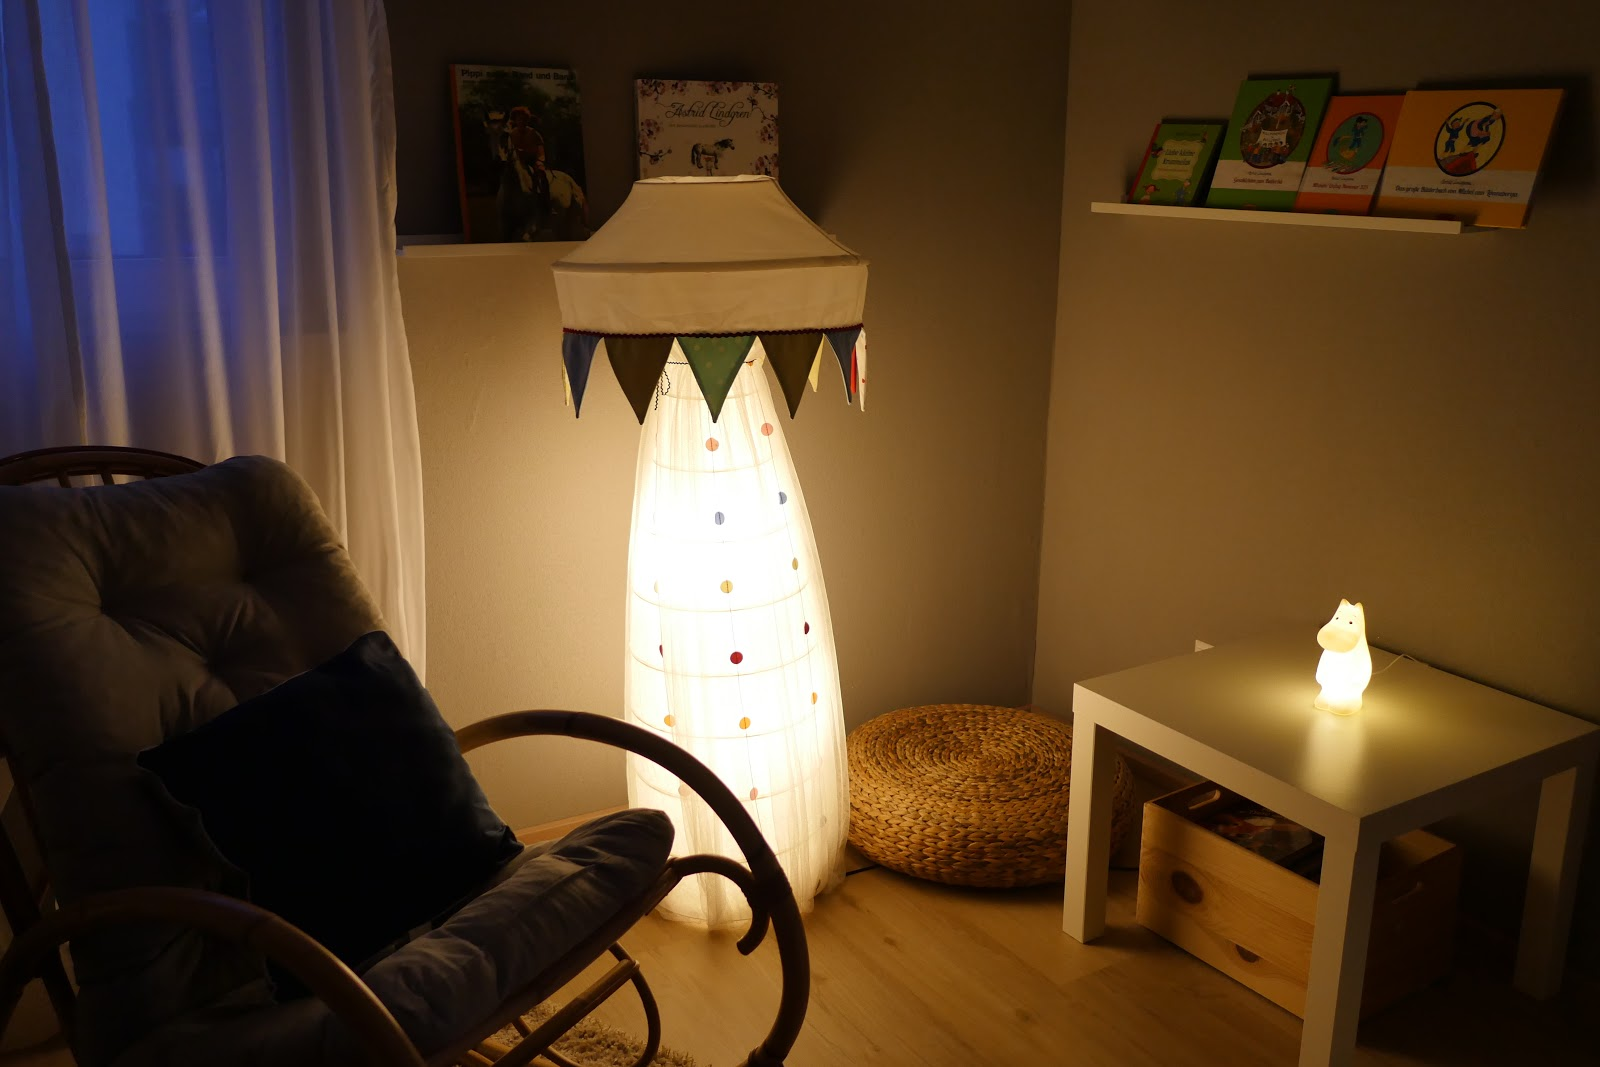 Full Size of Ikea Stehlampe Stockholm Hektar Stehlampen Deckenfluter Not Schirm Lampe Kaputt Lampenschirm Wohnzimmer Papier Hack Frs Kinderzimmer Schlafzimmer Sofa Mit Wohnzimmer Ikea Stehlampe